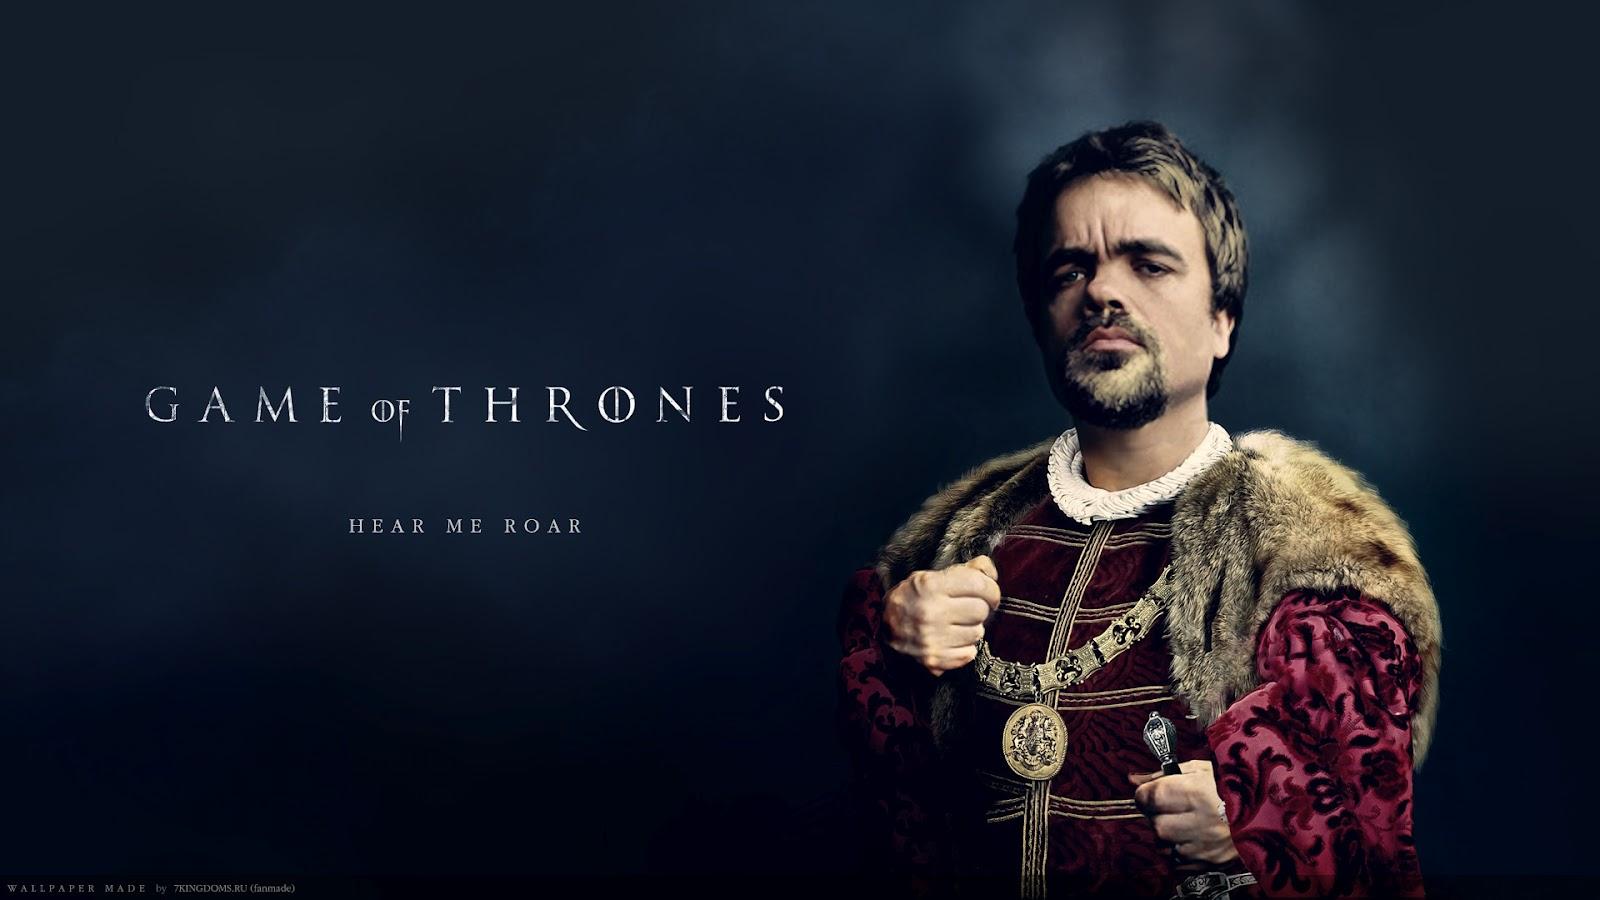 Iphone wallpaper los angeles - Wallpapers Hd Game Of Thrones 40 Wallpapers Fondo De